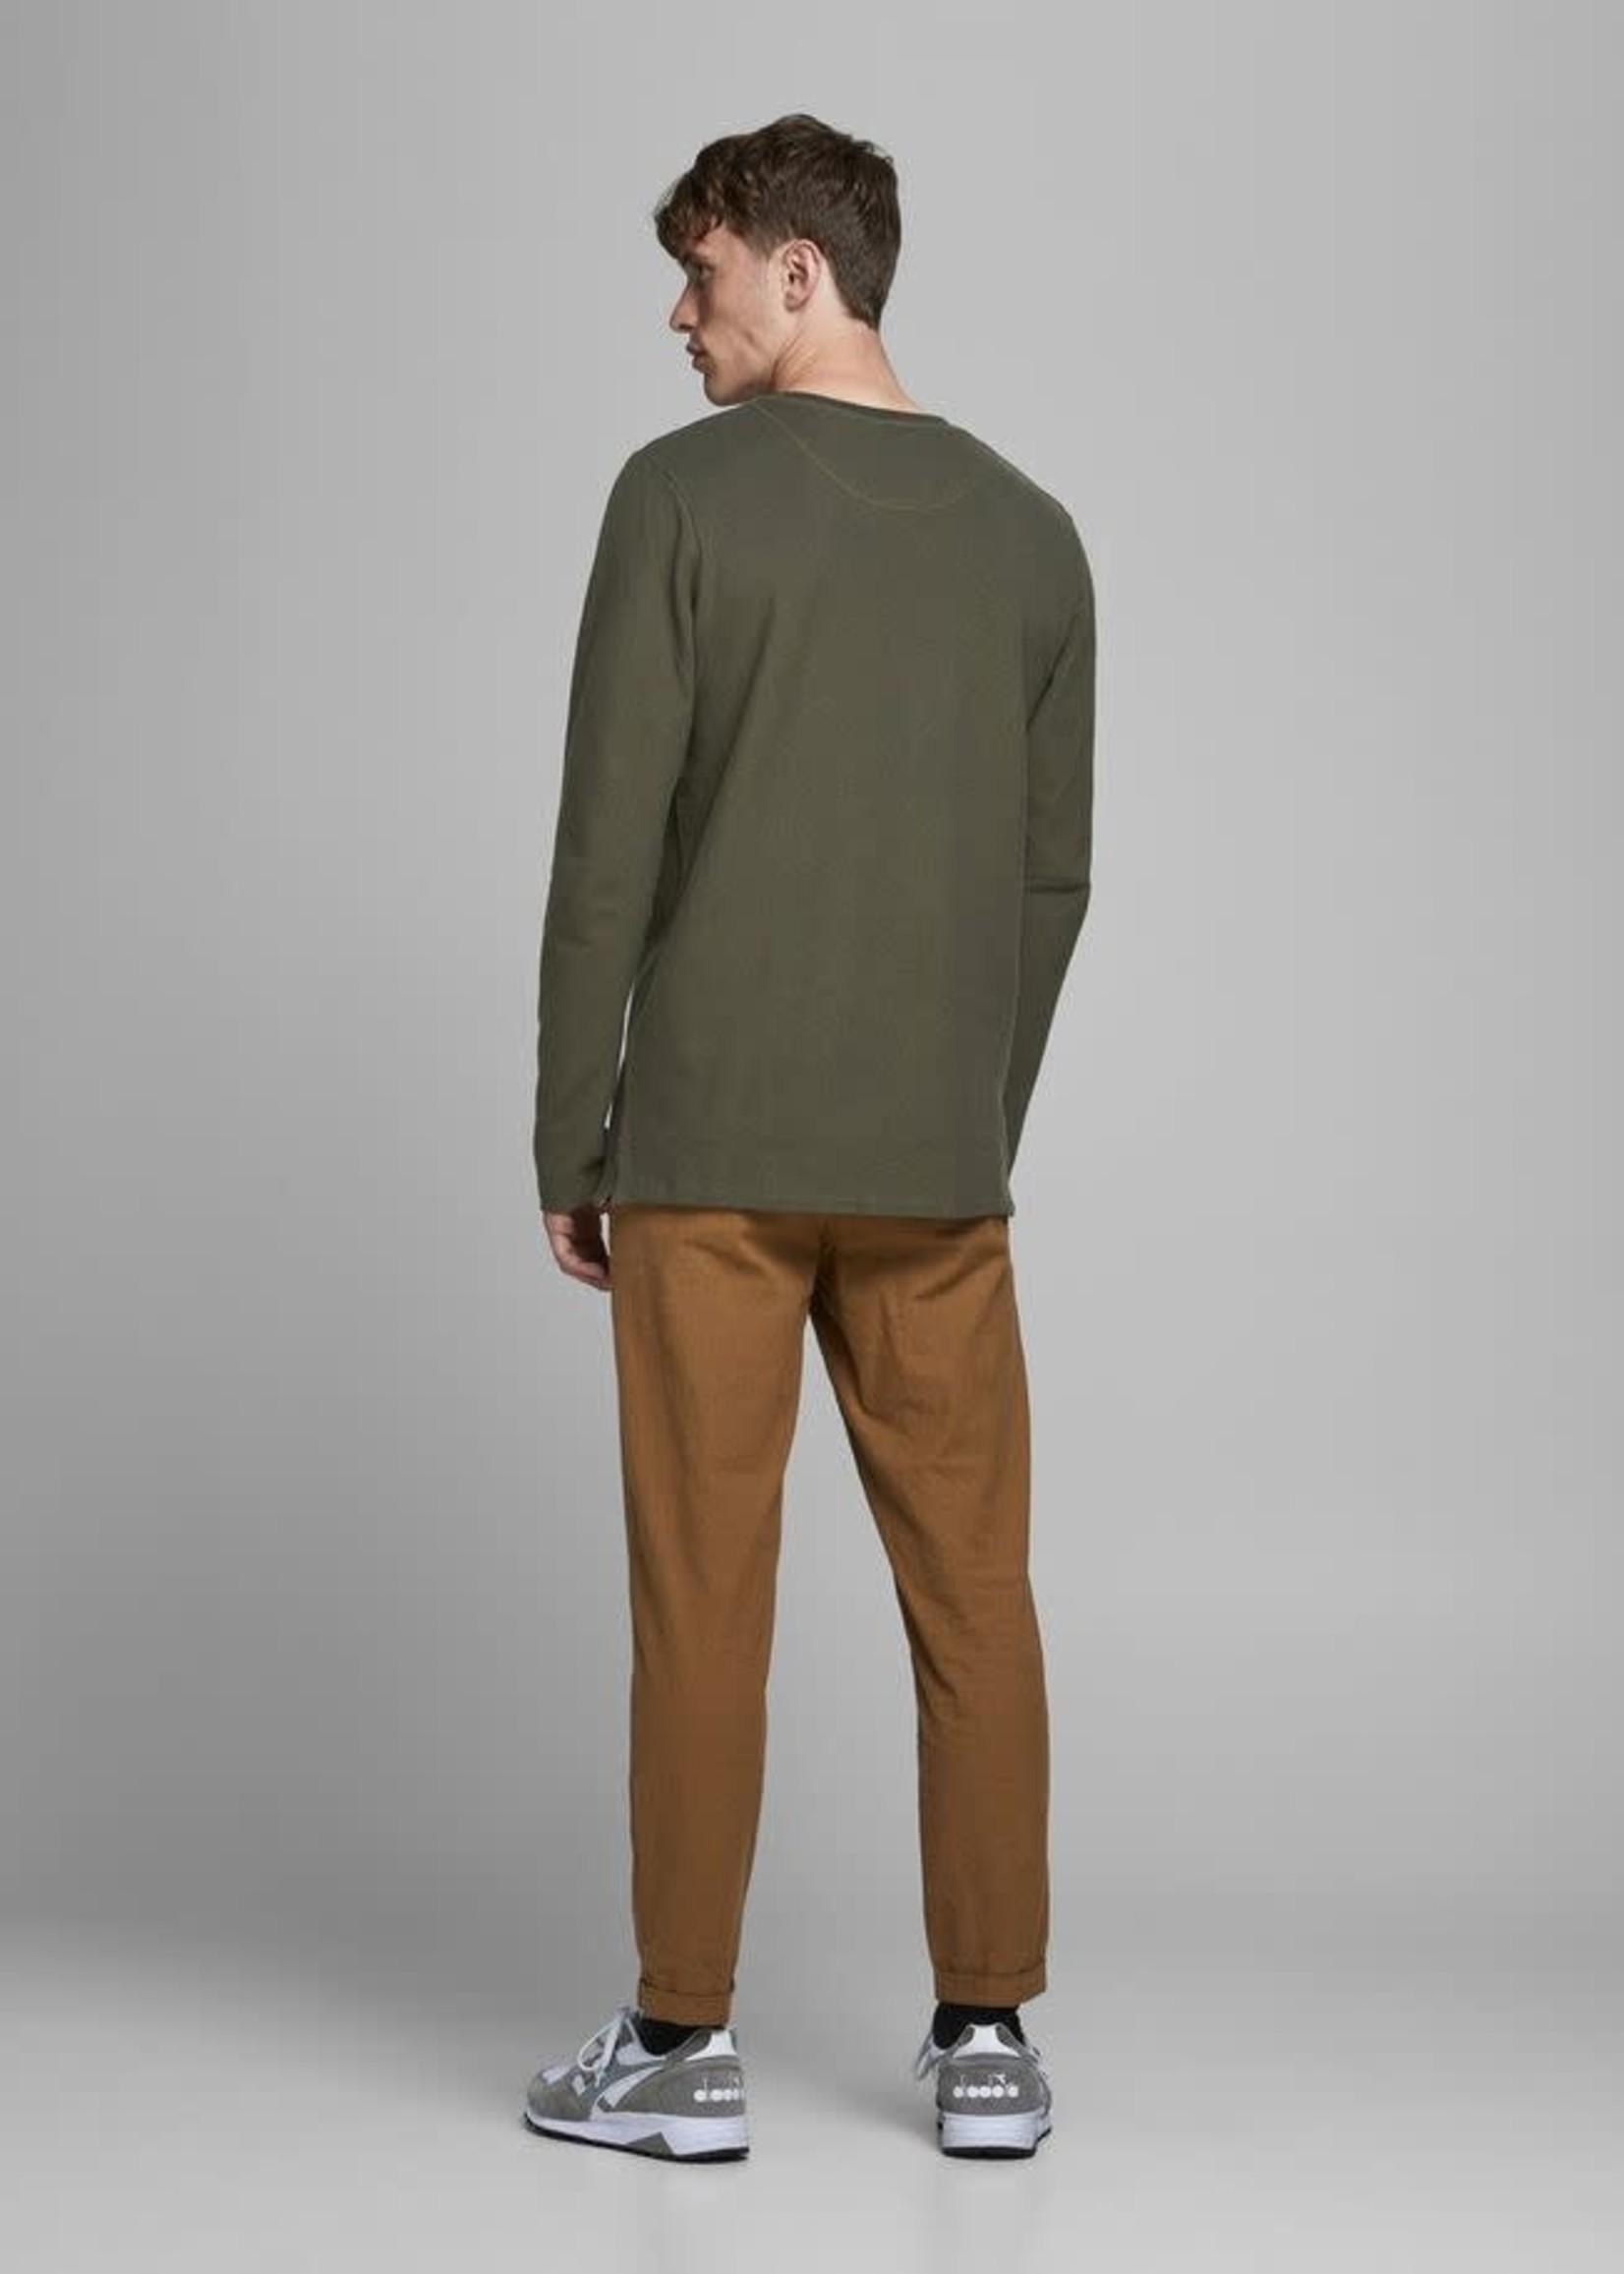 JACK & JONES Long Sleeve Henley T-Shirt